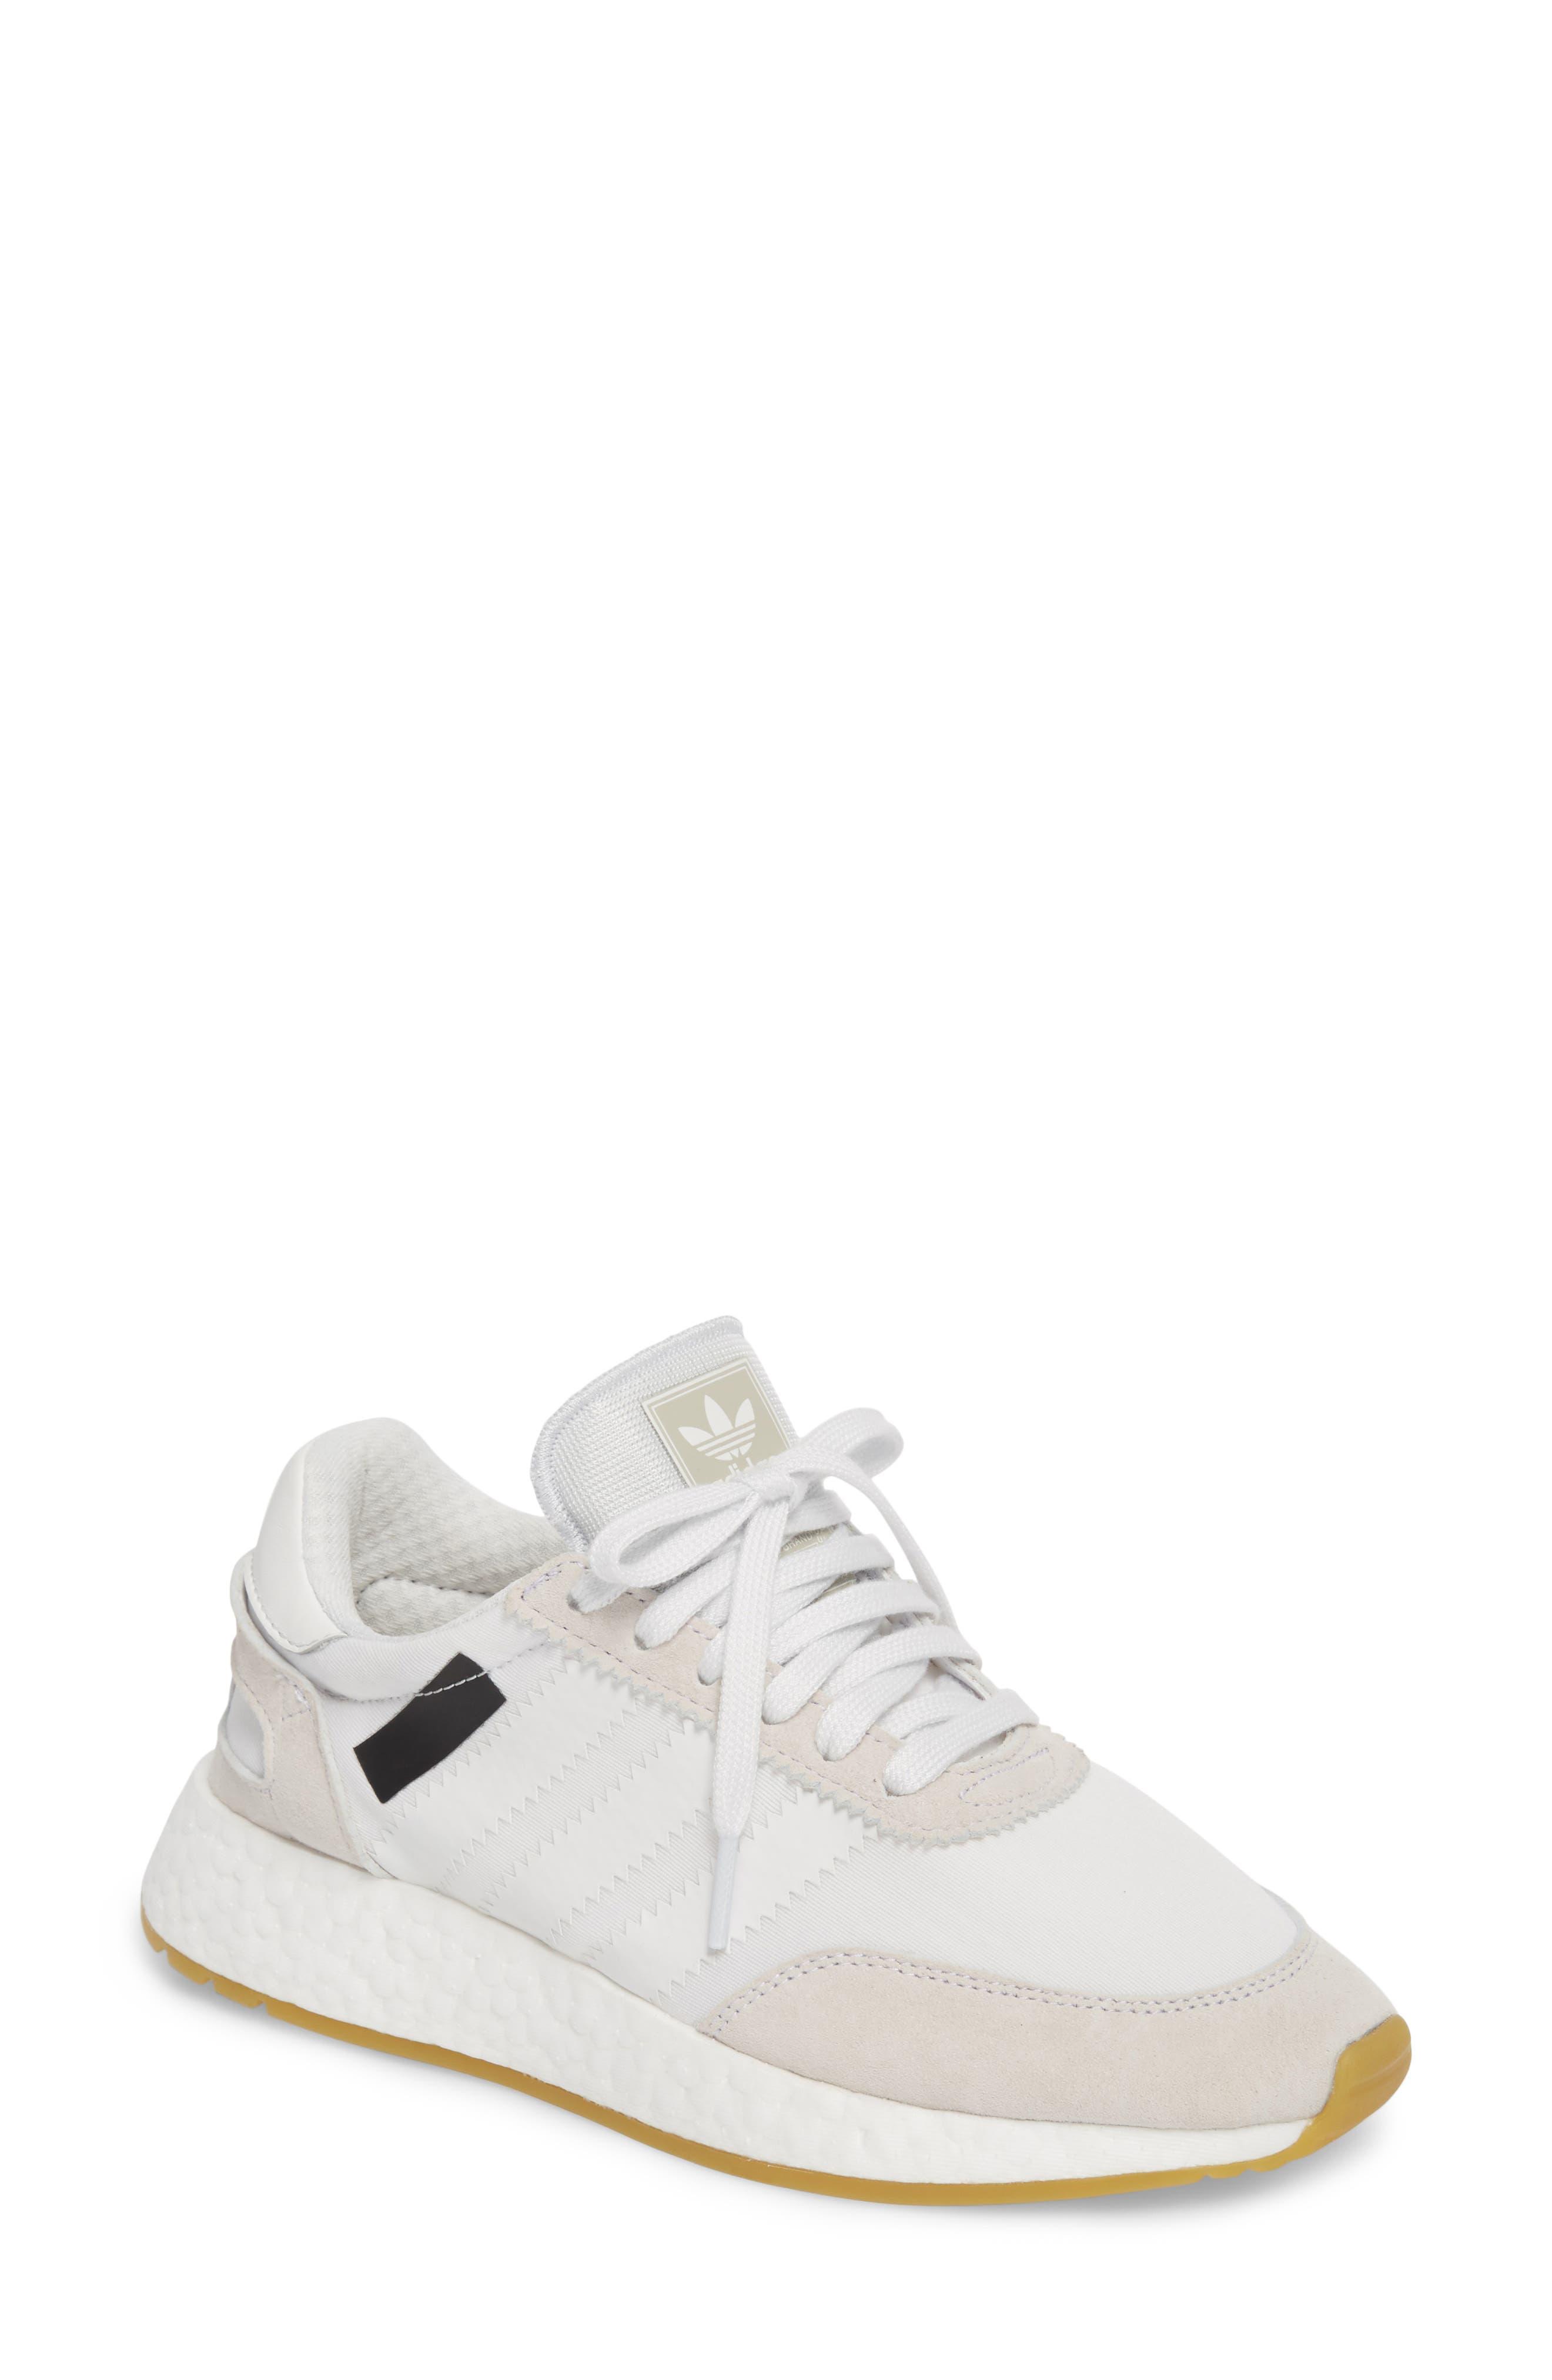 Main Image - adidas I-5923 Sneaker (Women)